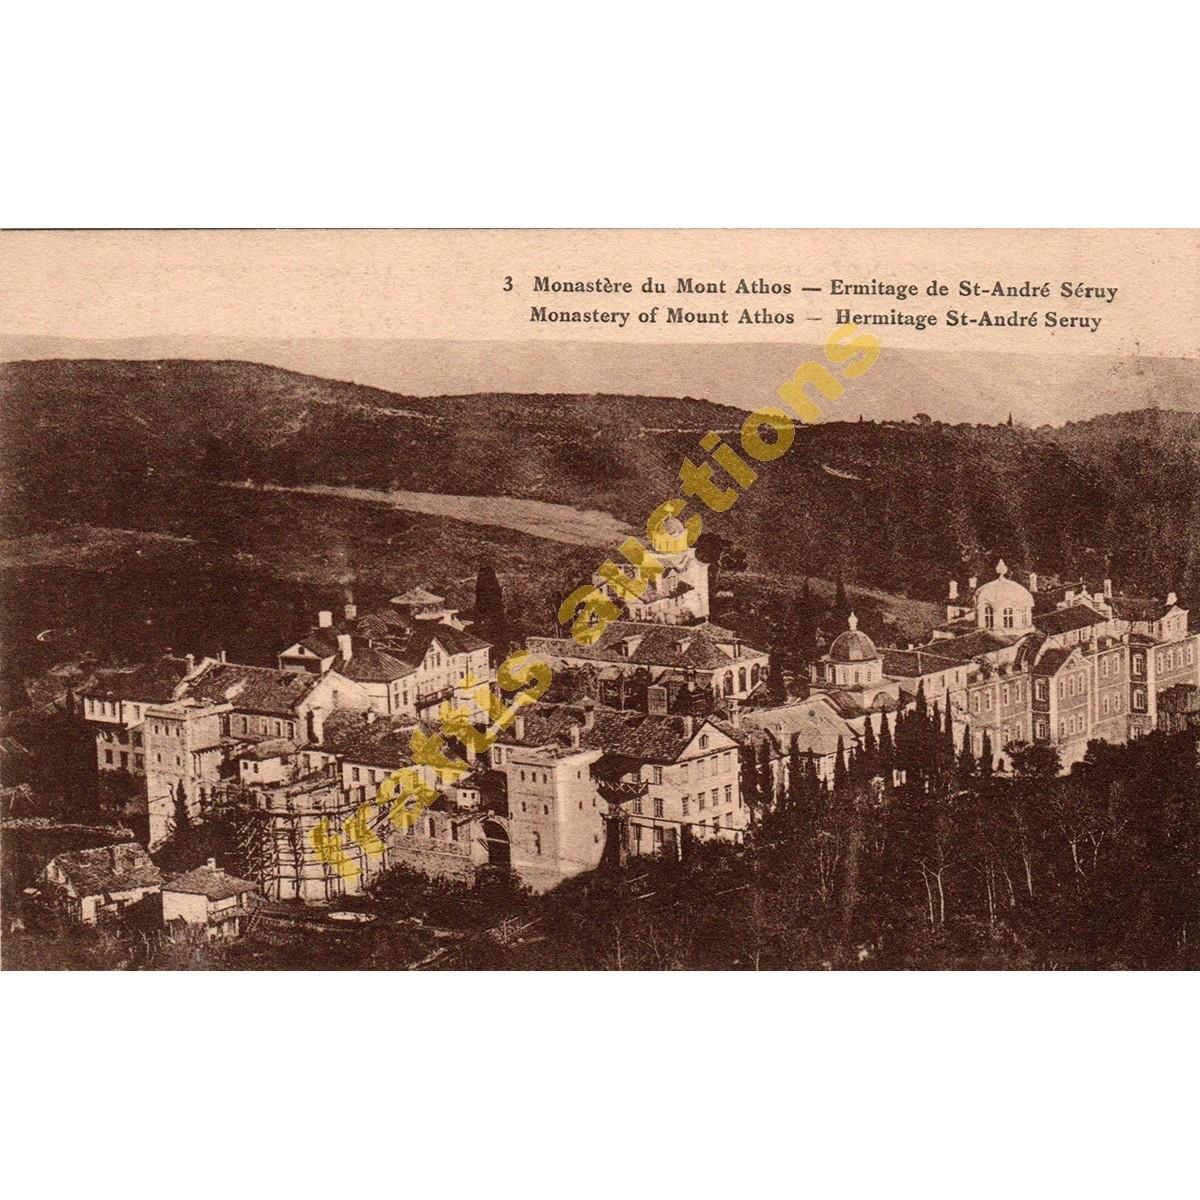 MONASTERY OF MOUNT ATHOS - HERMITAGE St. ANDRE SERUY, Parisiana, Paris, 3